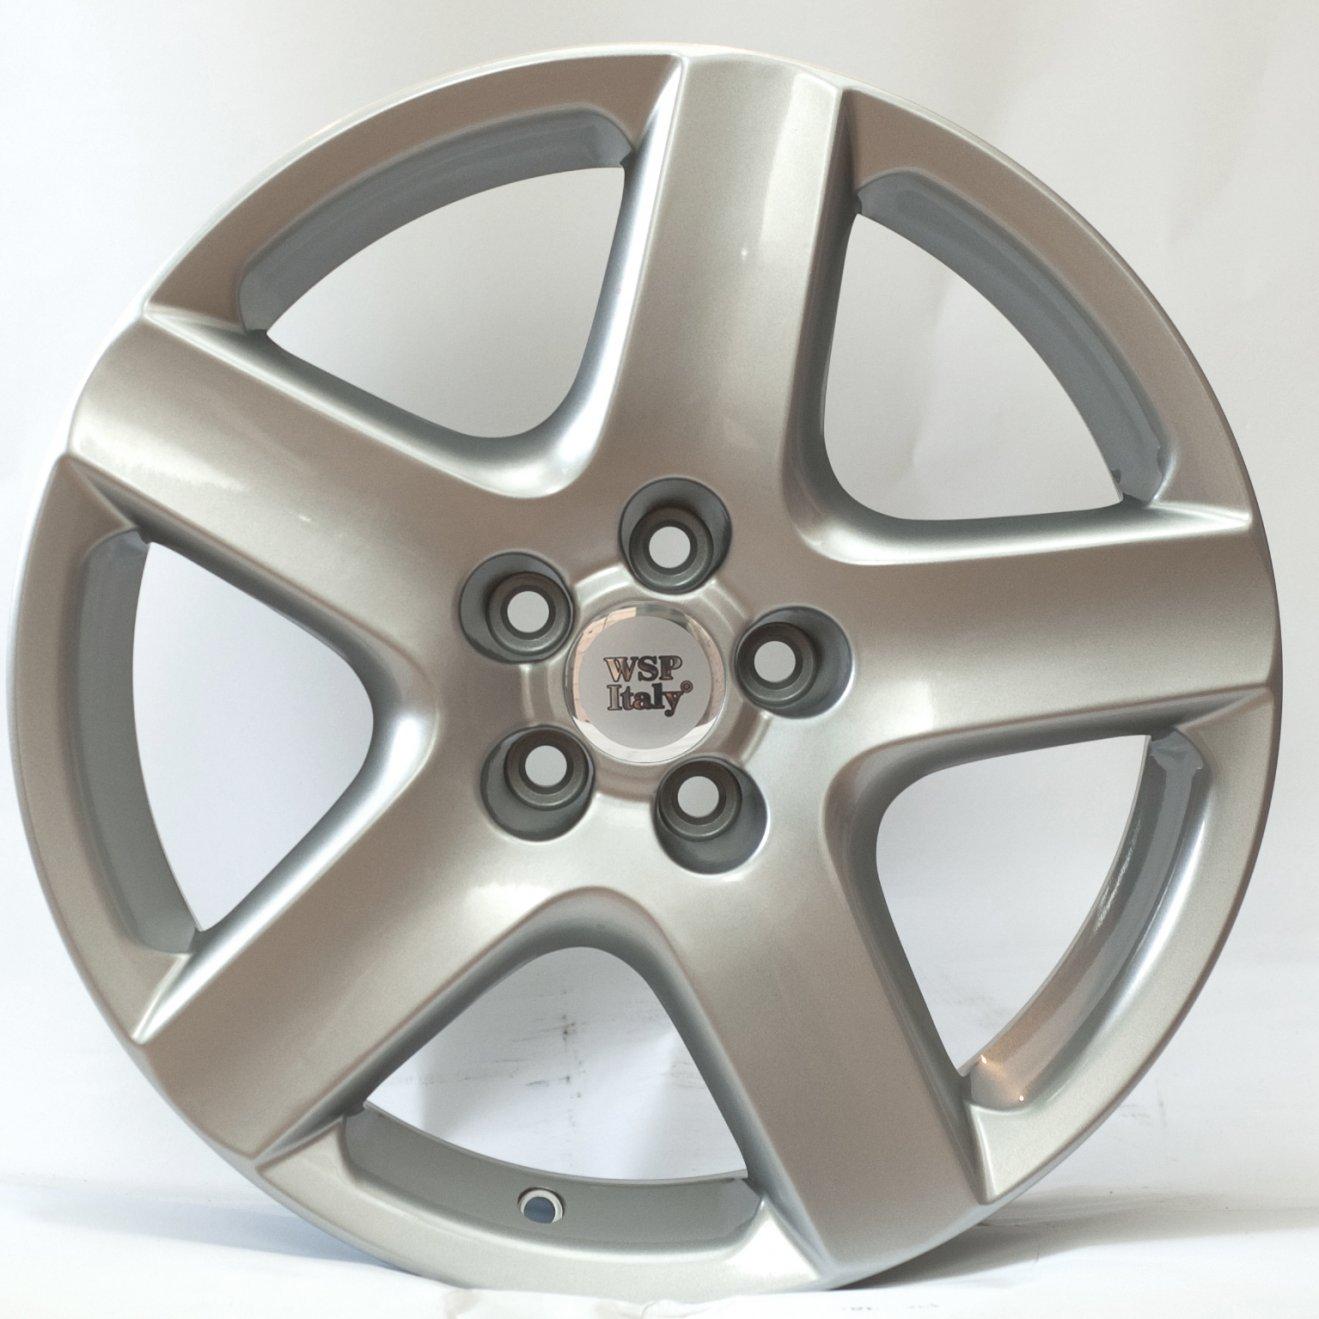 WSP Italy Volkswagen (W436) Ravello